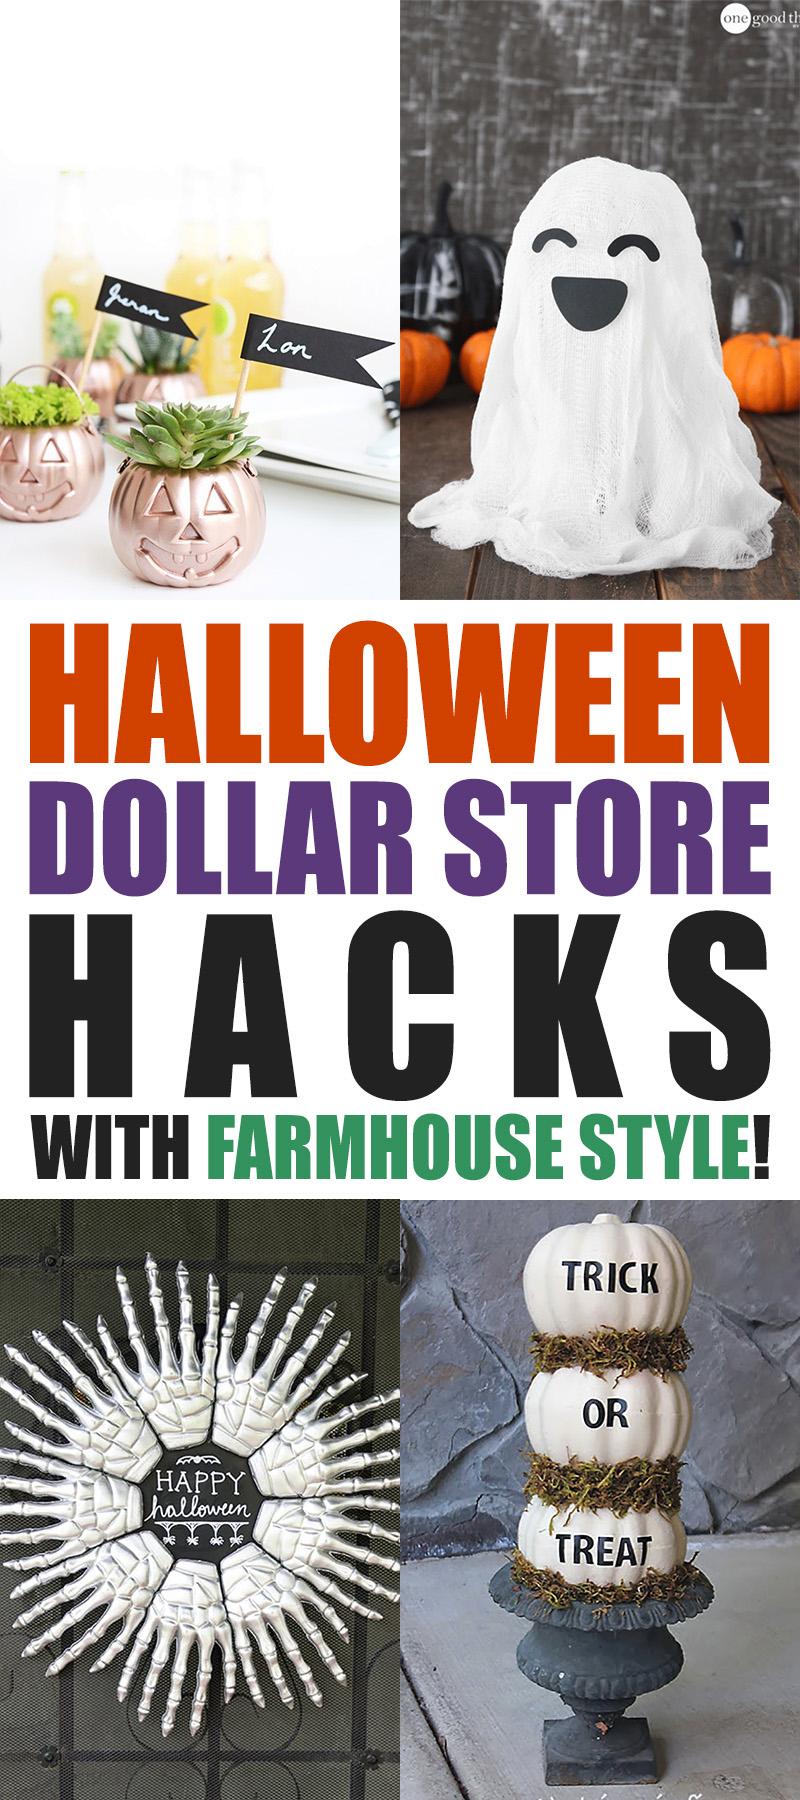 Halloween Dollar Store Hacks with Farmhouse Style Dollar